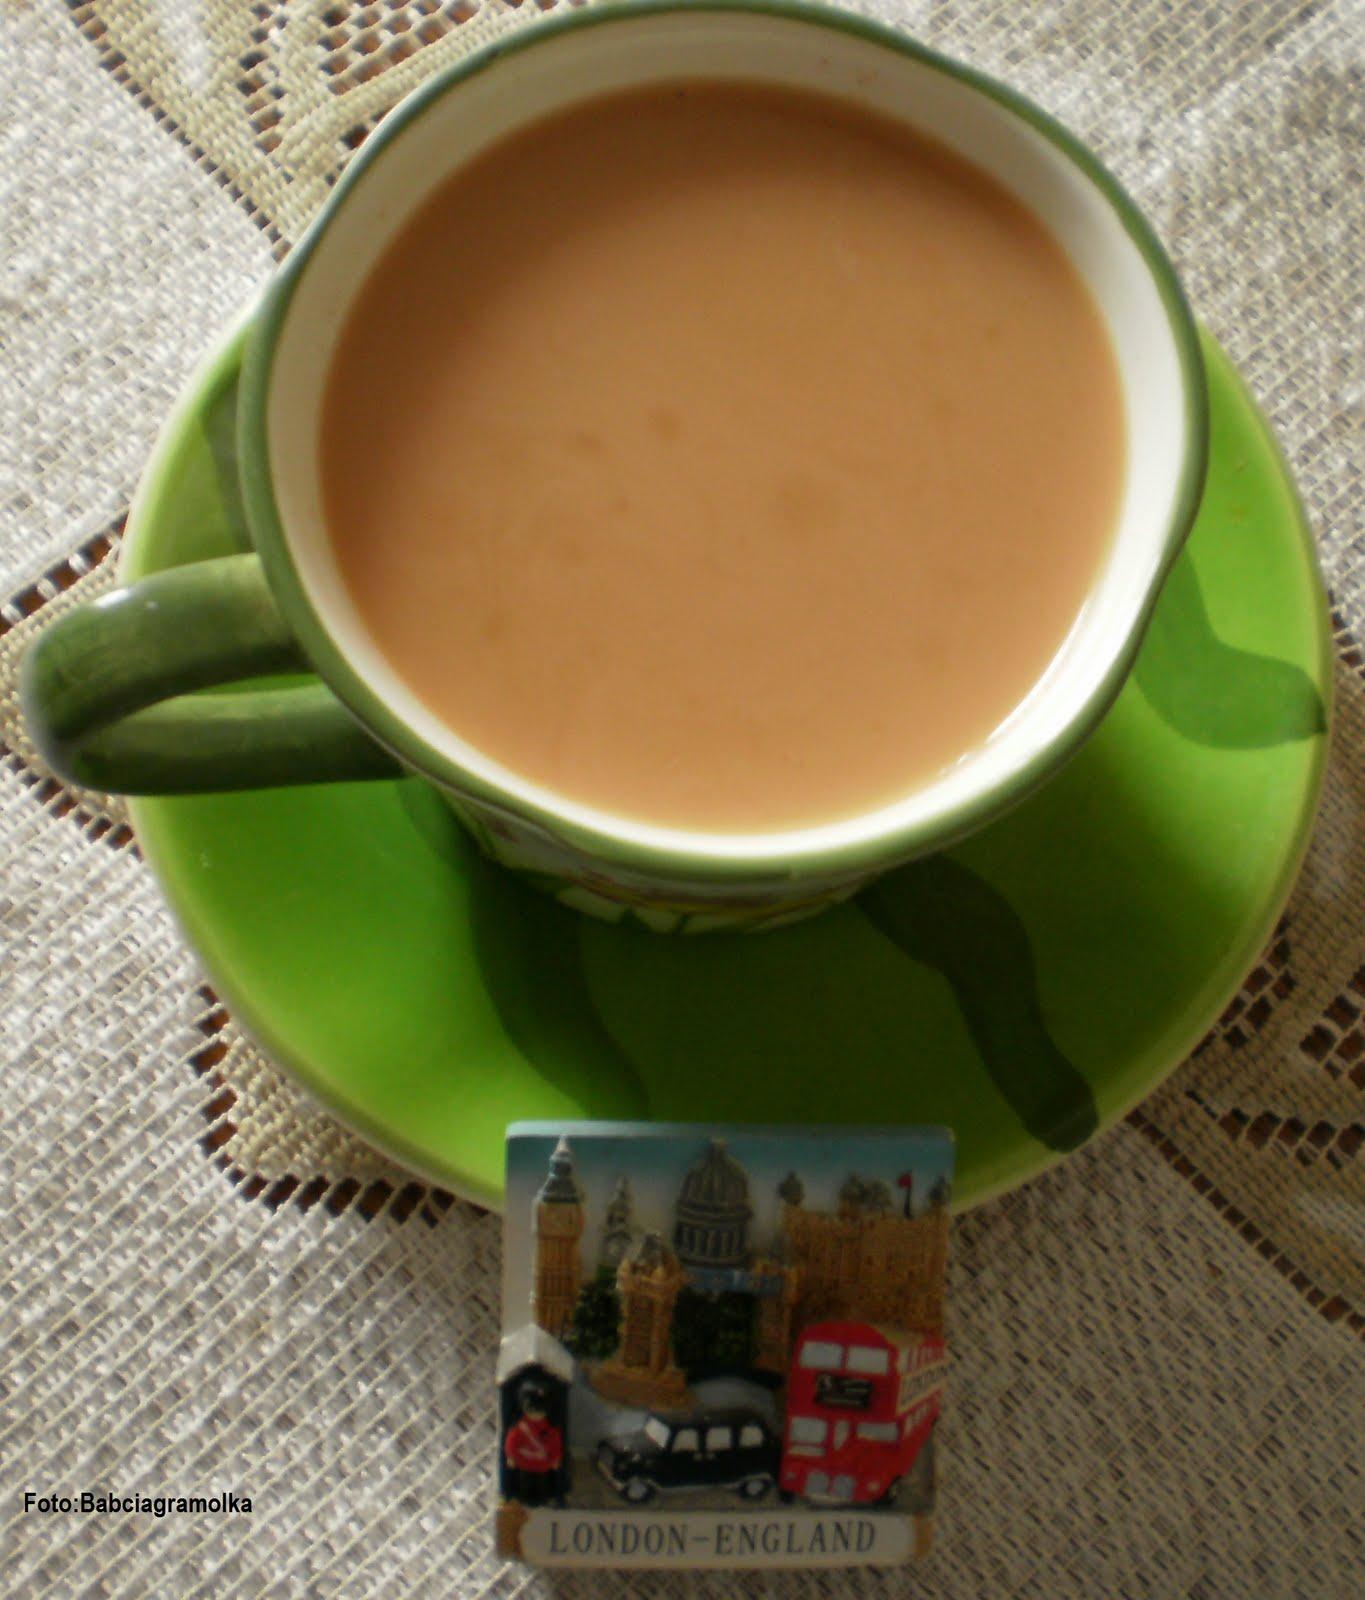 Buniabaje w kuchni Herbata po angielsku wg Buni -> Kuchnia Angielska Herbata Po Angielsku